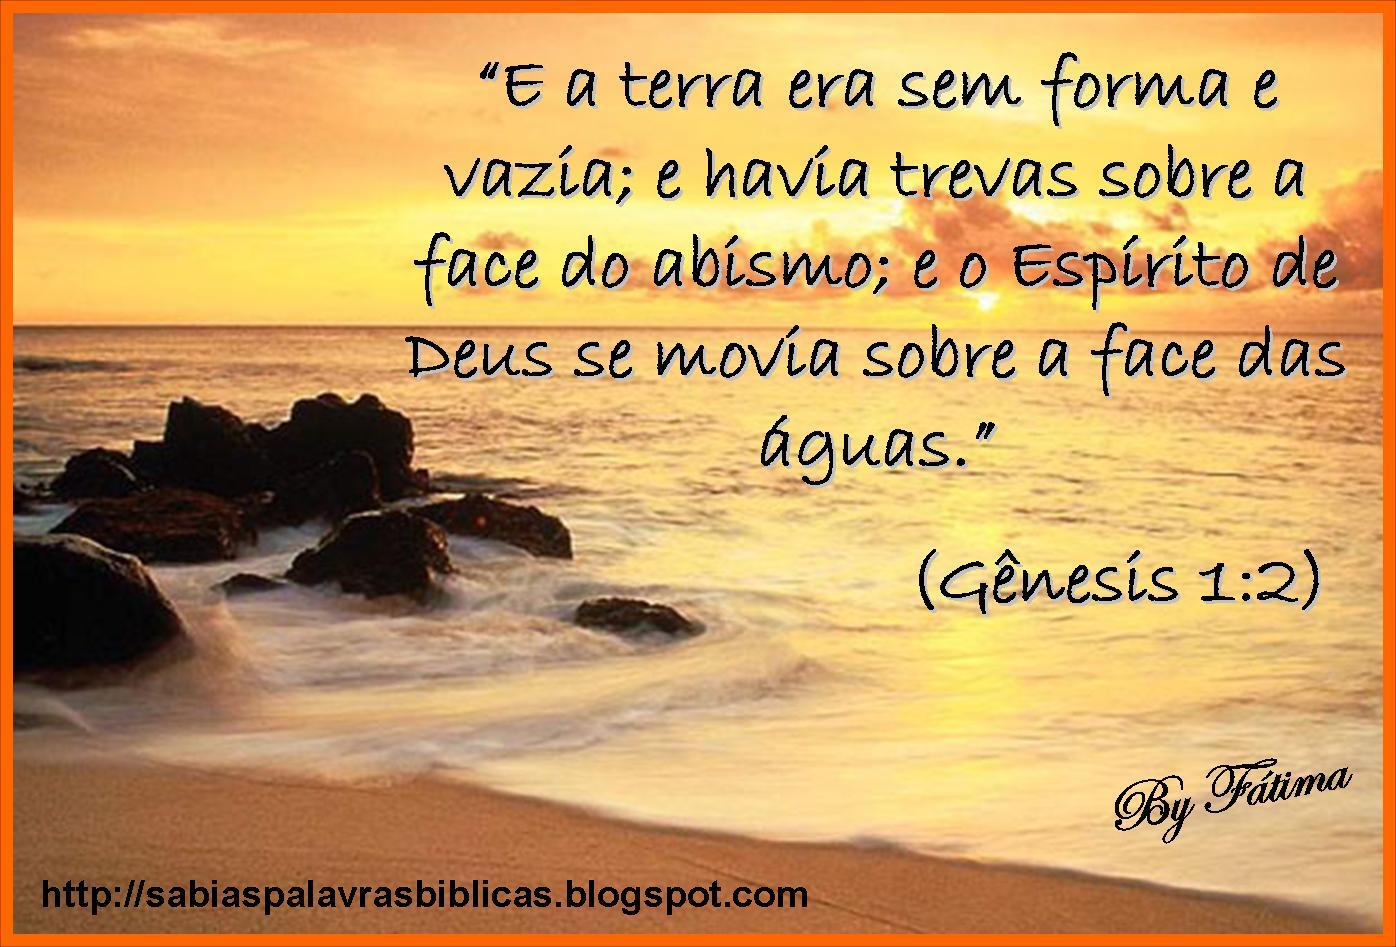 """Sábias Palavras Bíblicas"": 01/01/2011 - 02/01/2011"